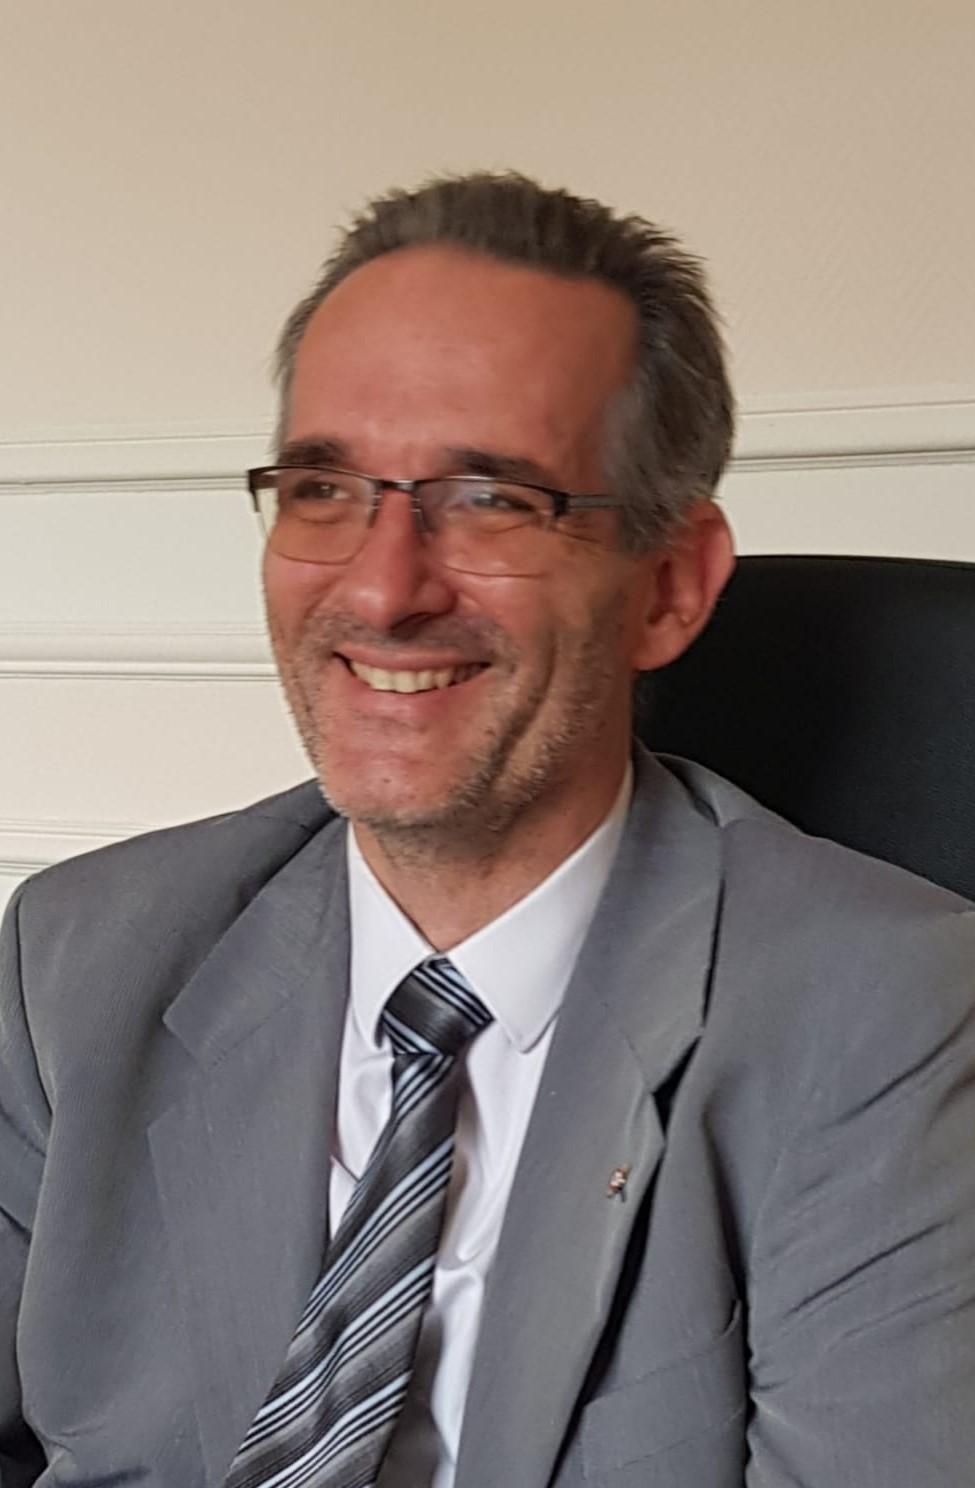 Jean-Christophe MAZURIER